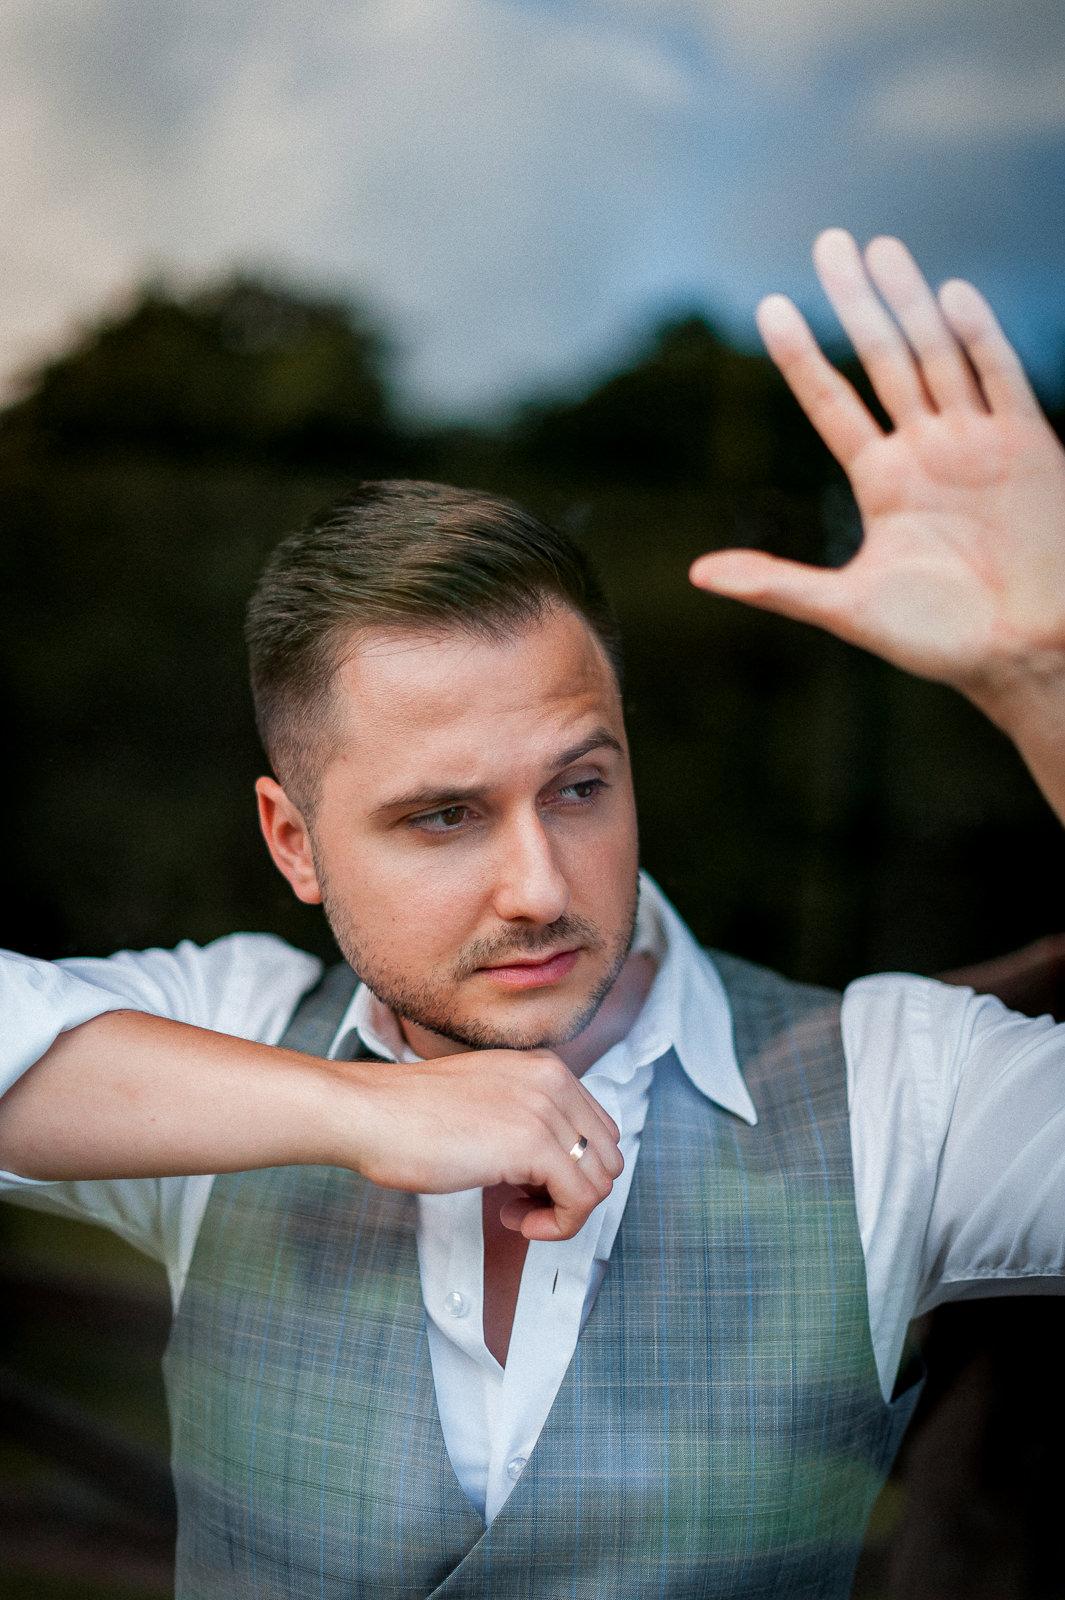 potret pana młodego fotograf-weselny-Malbork-fotografia-ślubna-Malbork-sesja-ślubna-Malbork